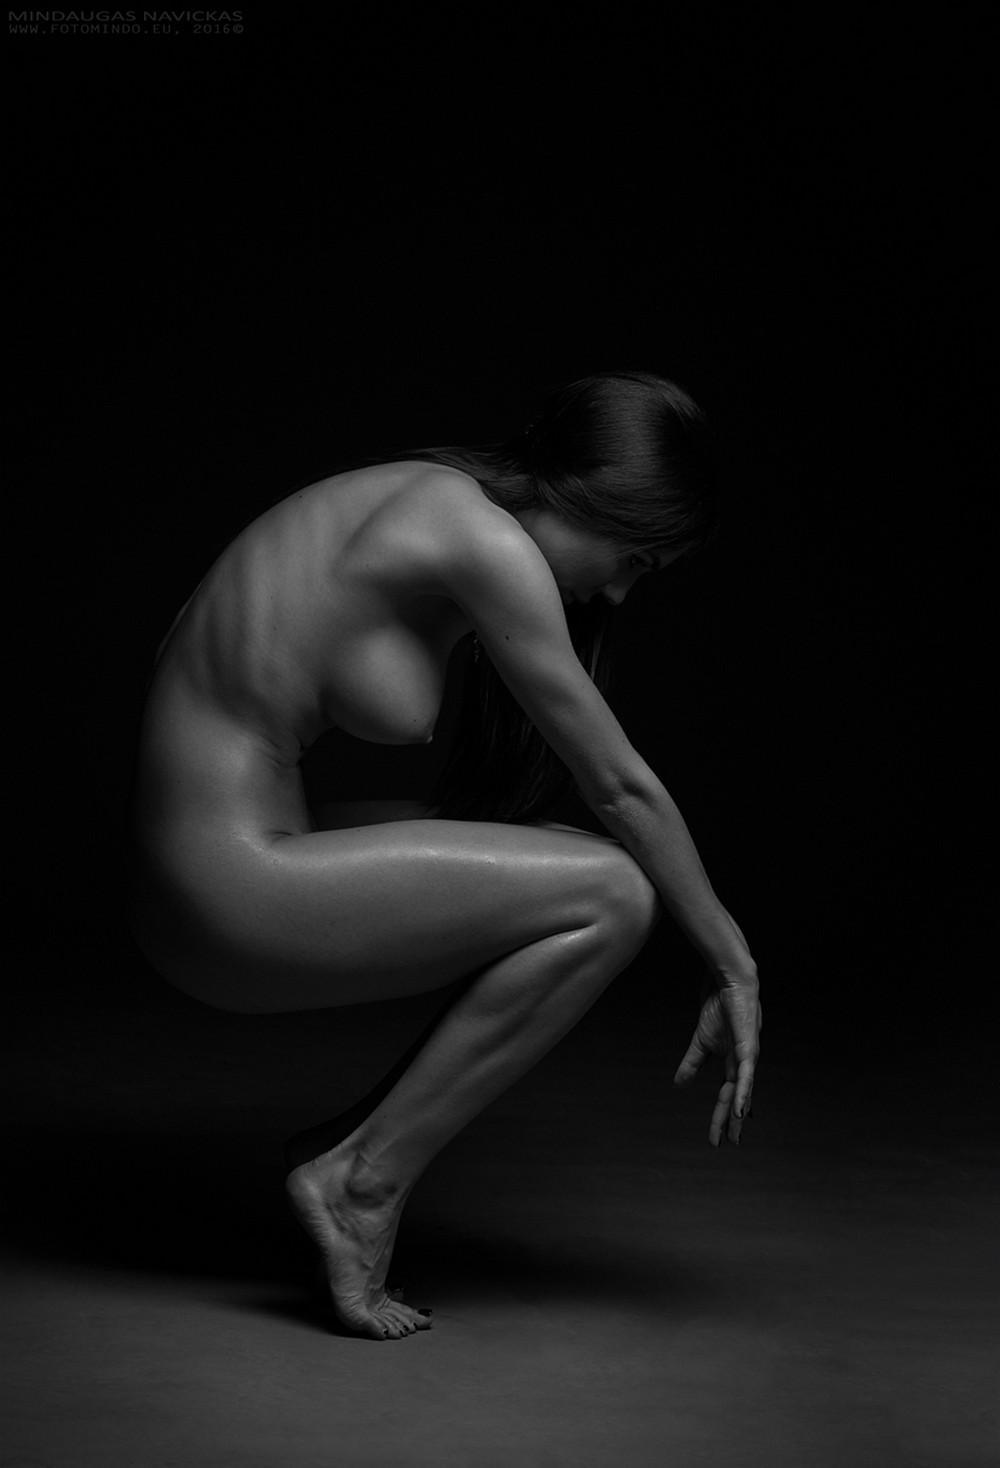 Чувственные снимки девушек от Миндаугаса Навицкаса